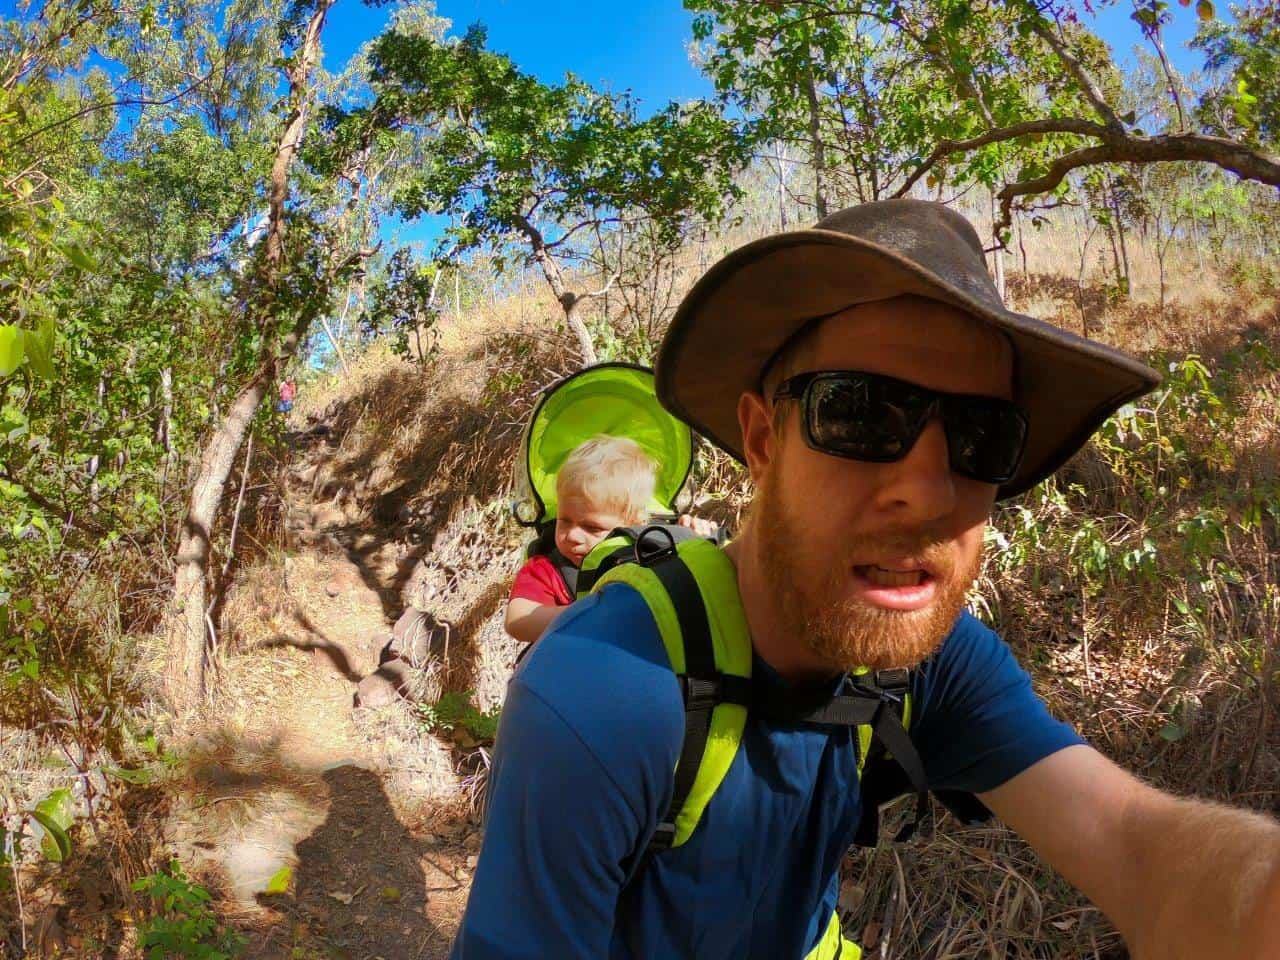 Taking Oliver hiking